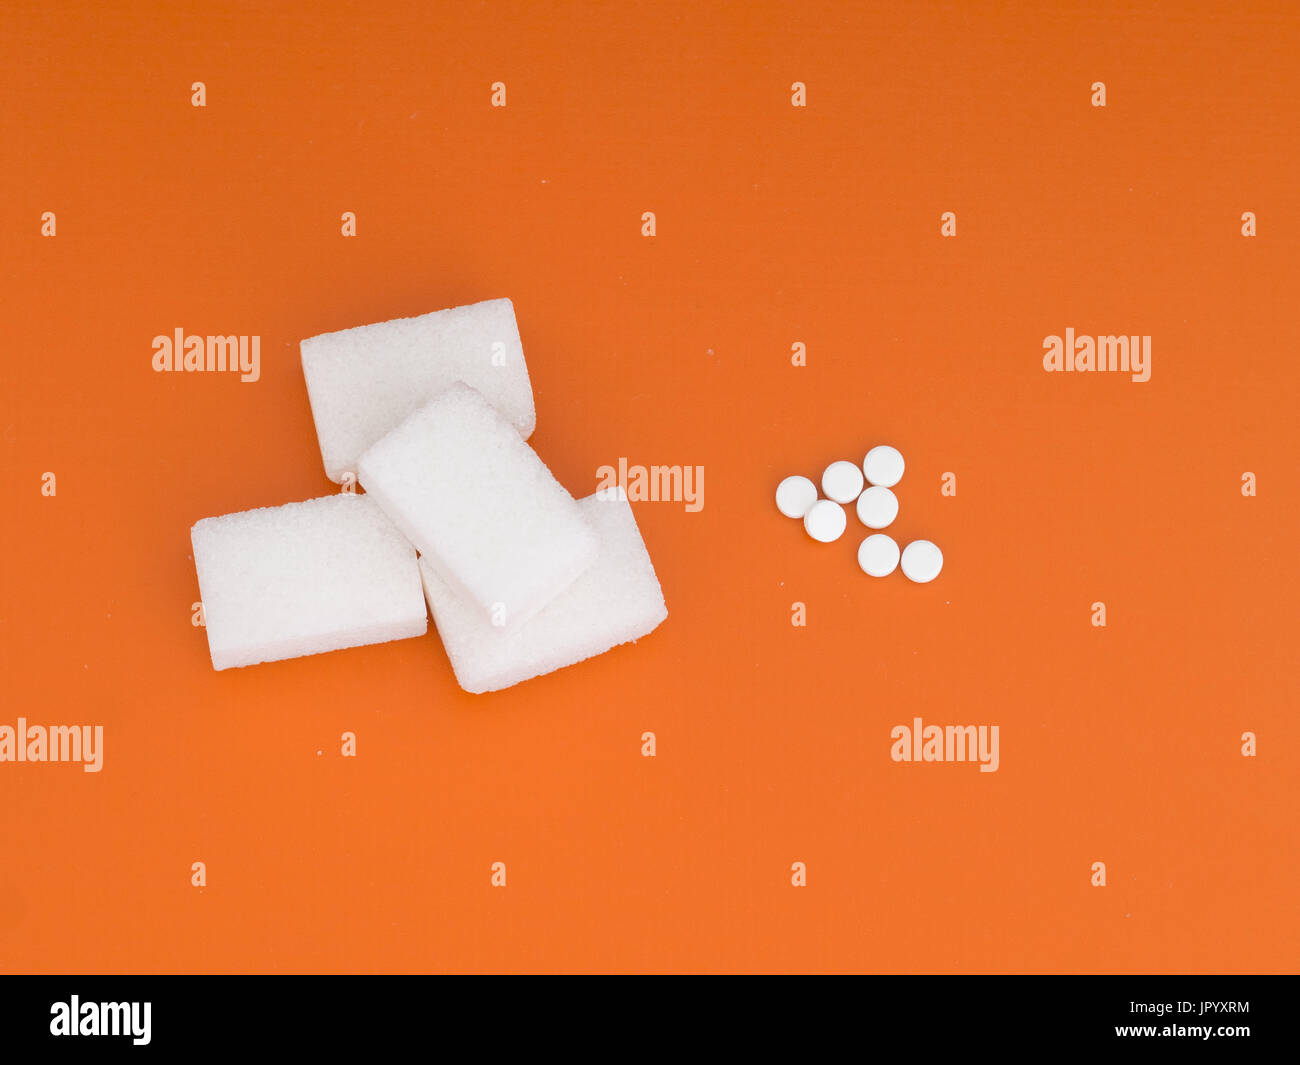 Diet decision. Sugar or aspartame sweetener. - Stock Image